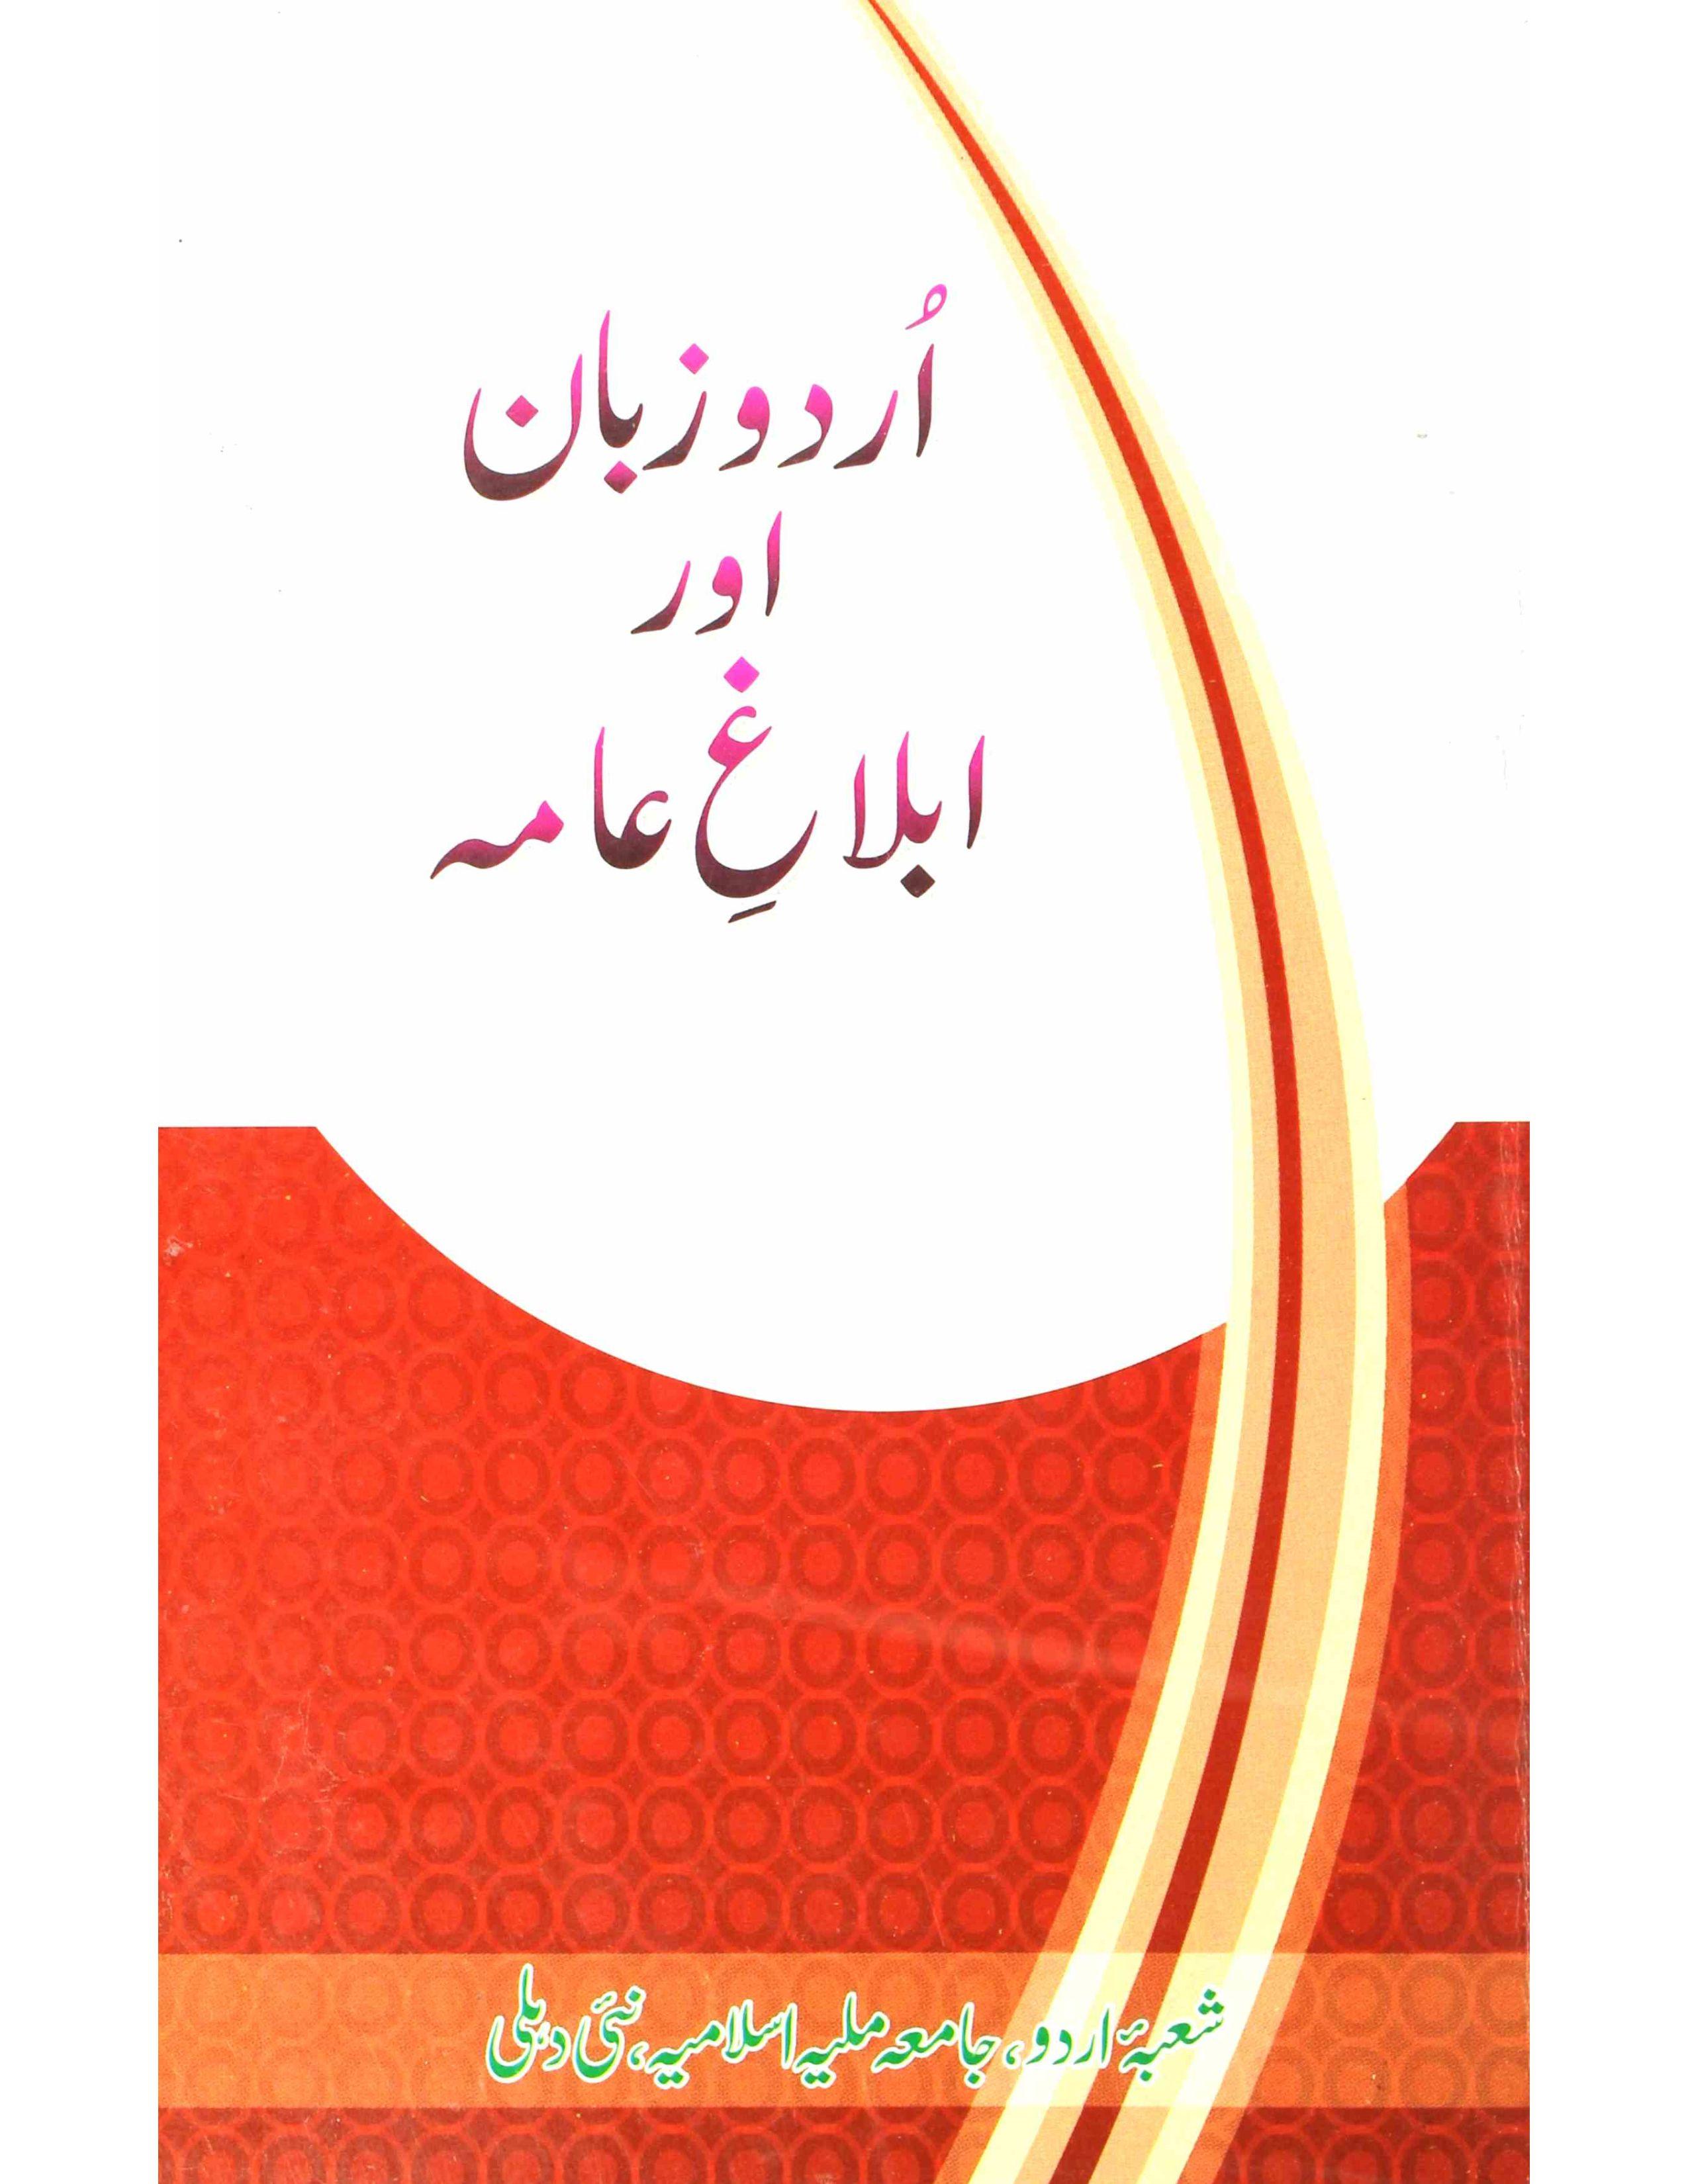 Urdu Zaban Aur Iblagh-e-Aamma